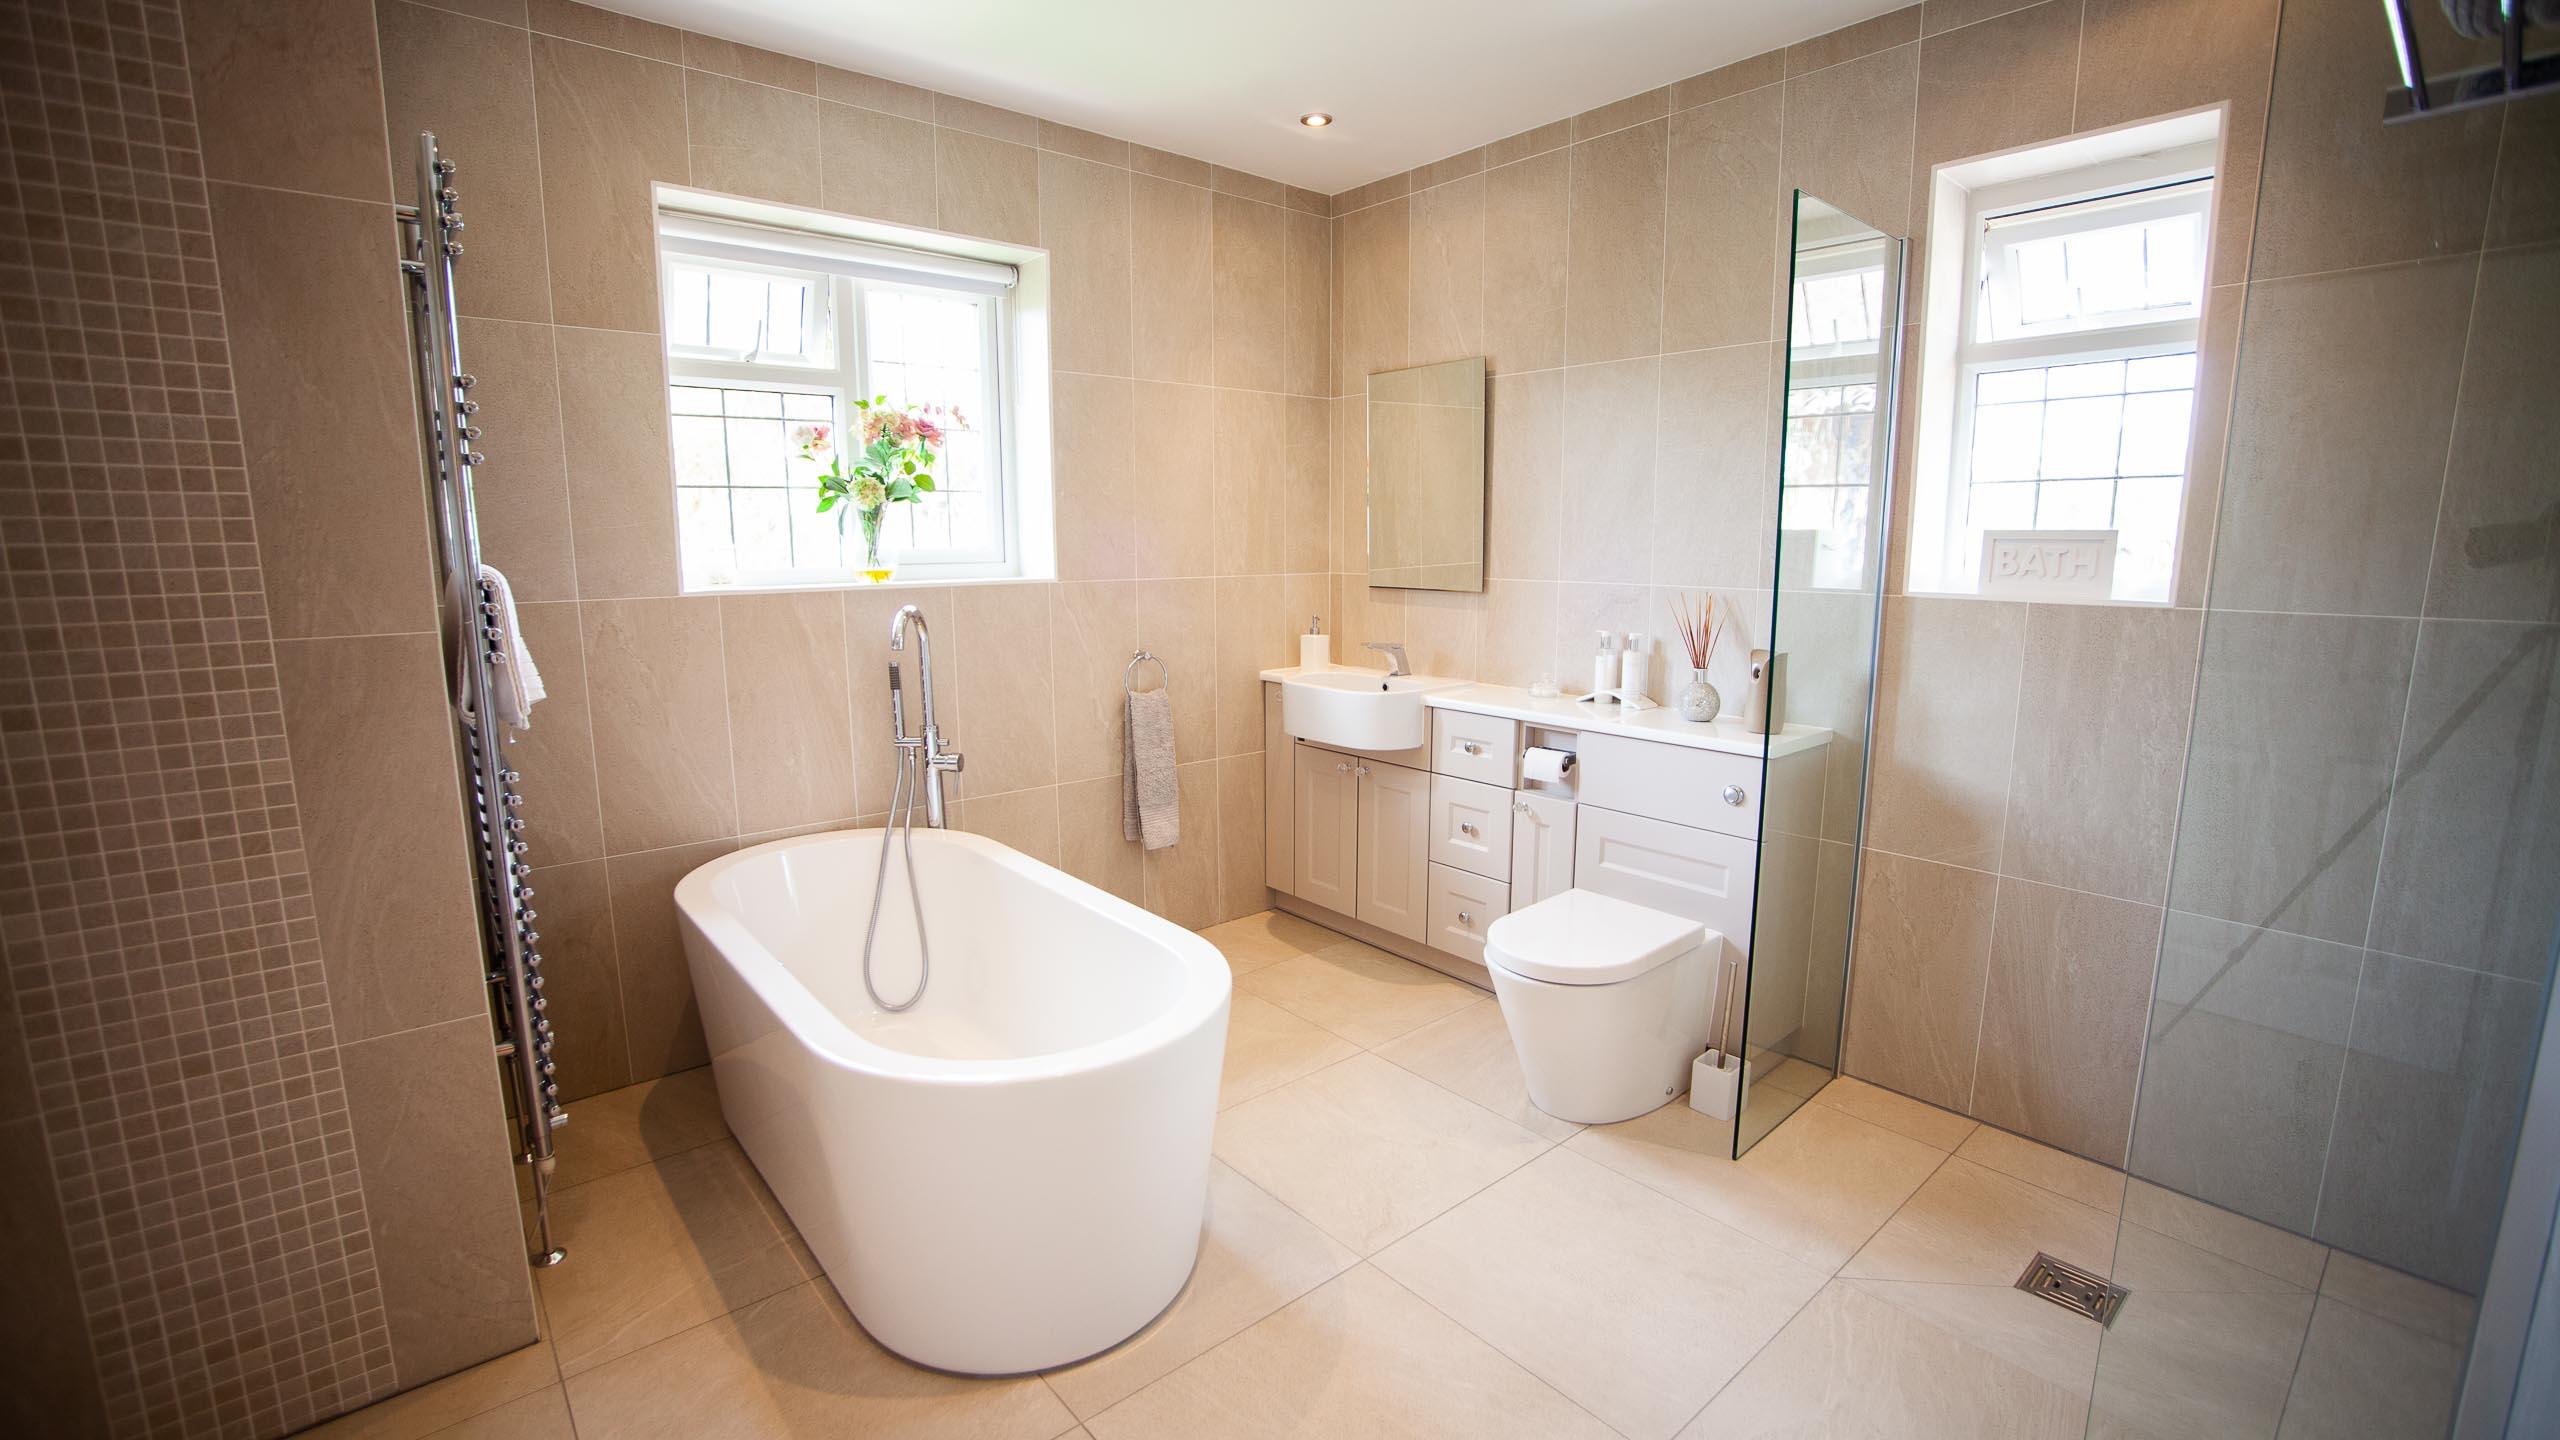 modern bathroom - bathroom installation by RJ Steele bathroom installers